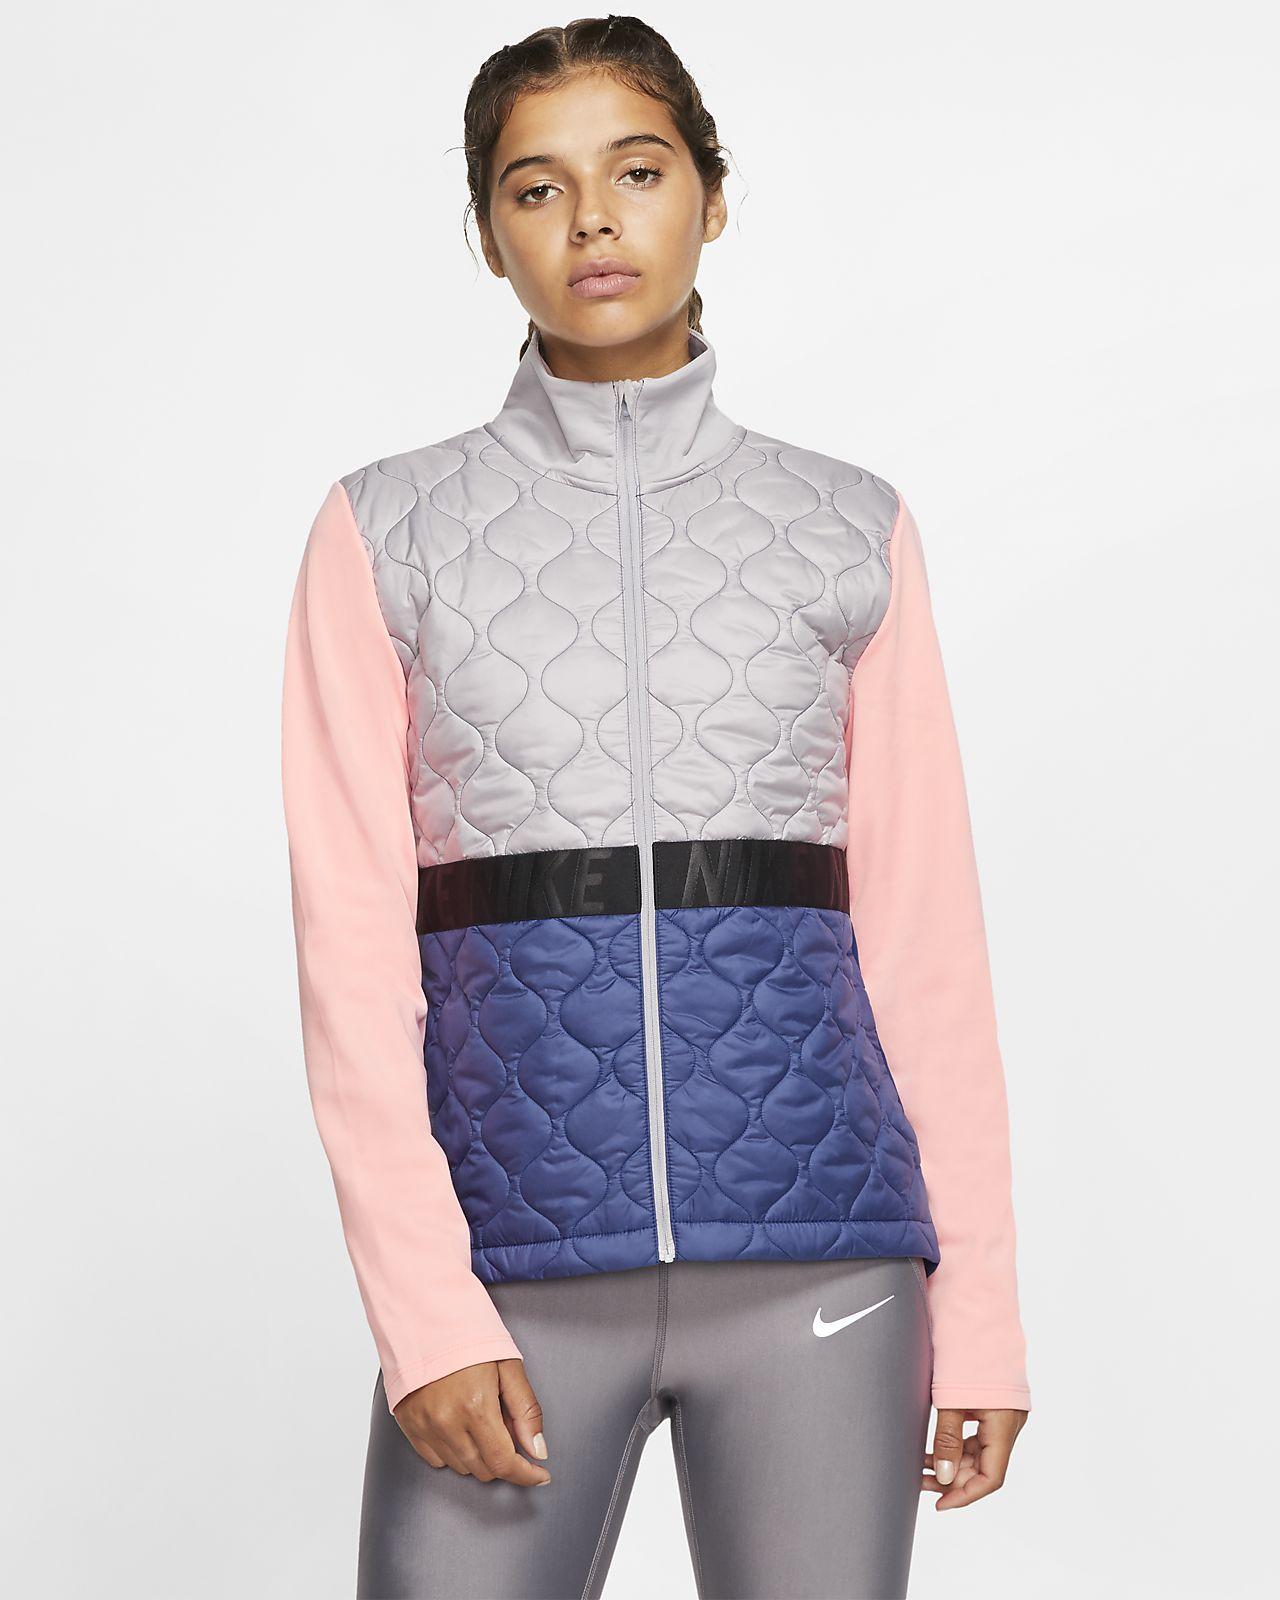 Chamarra de running para mujer Nike AeroLayer